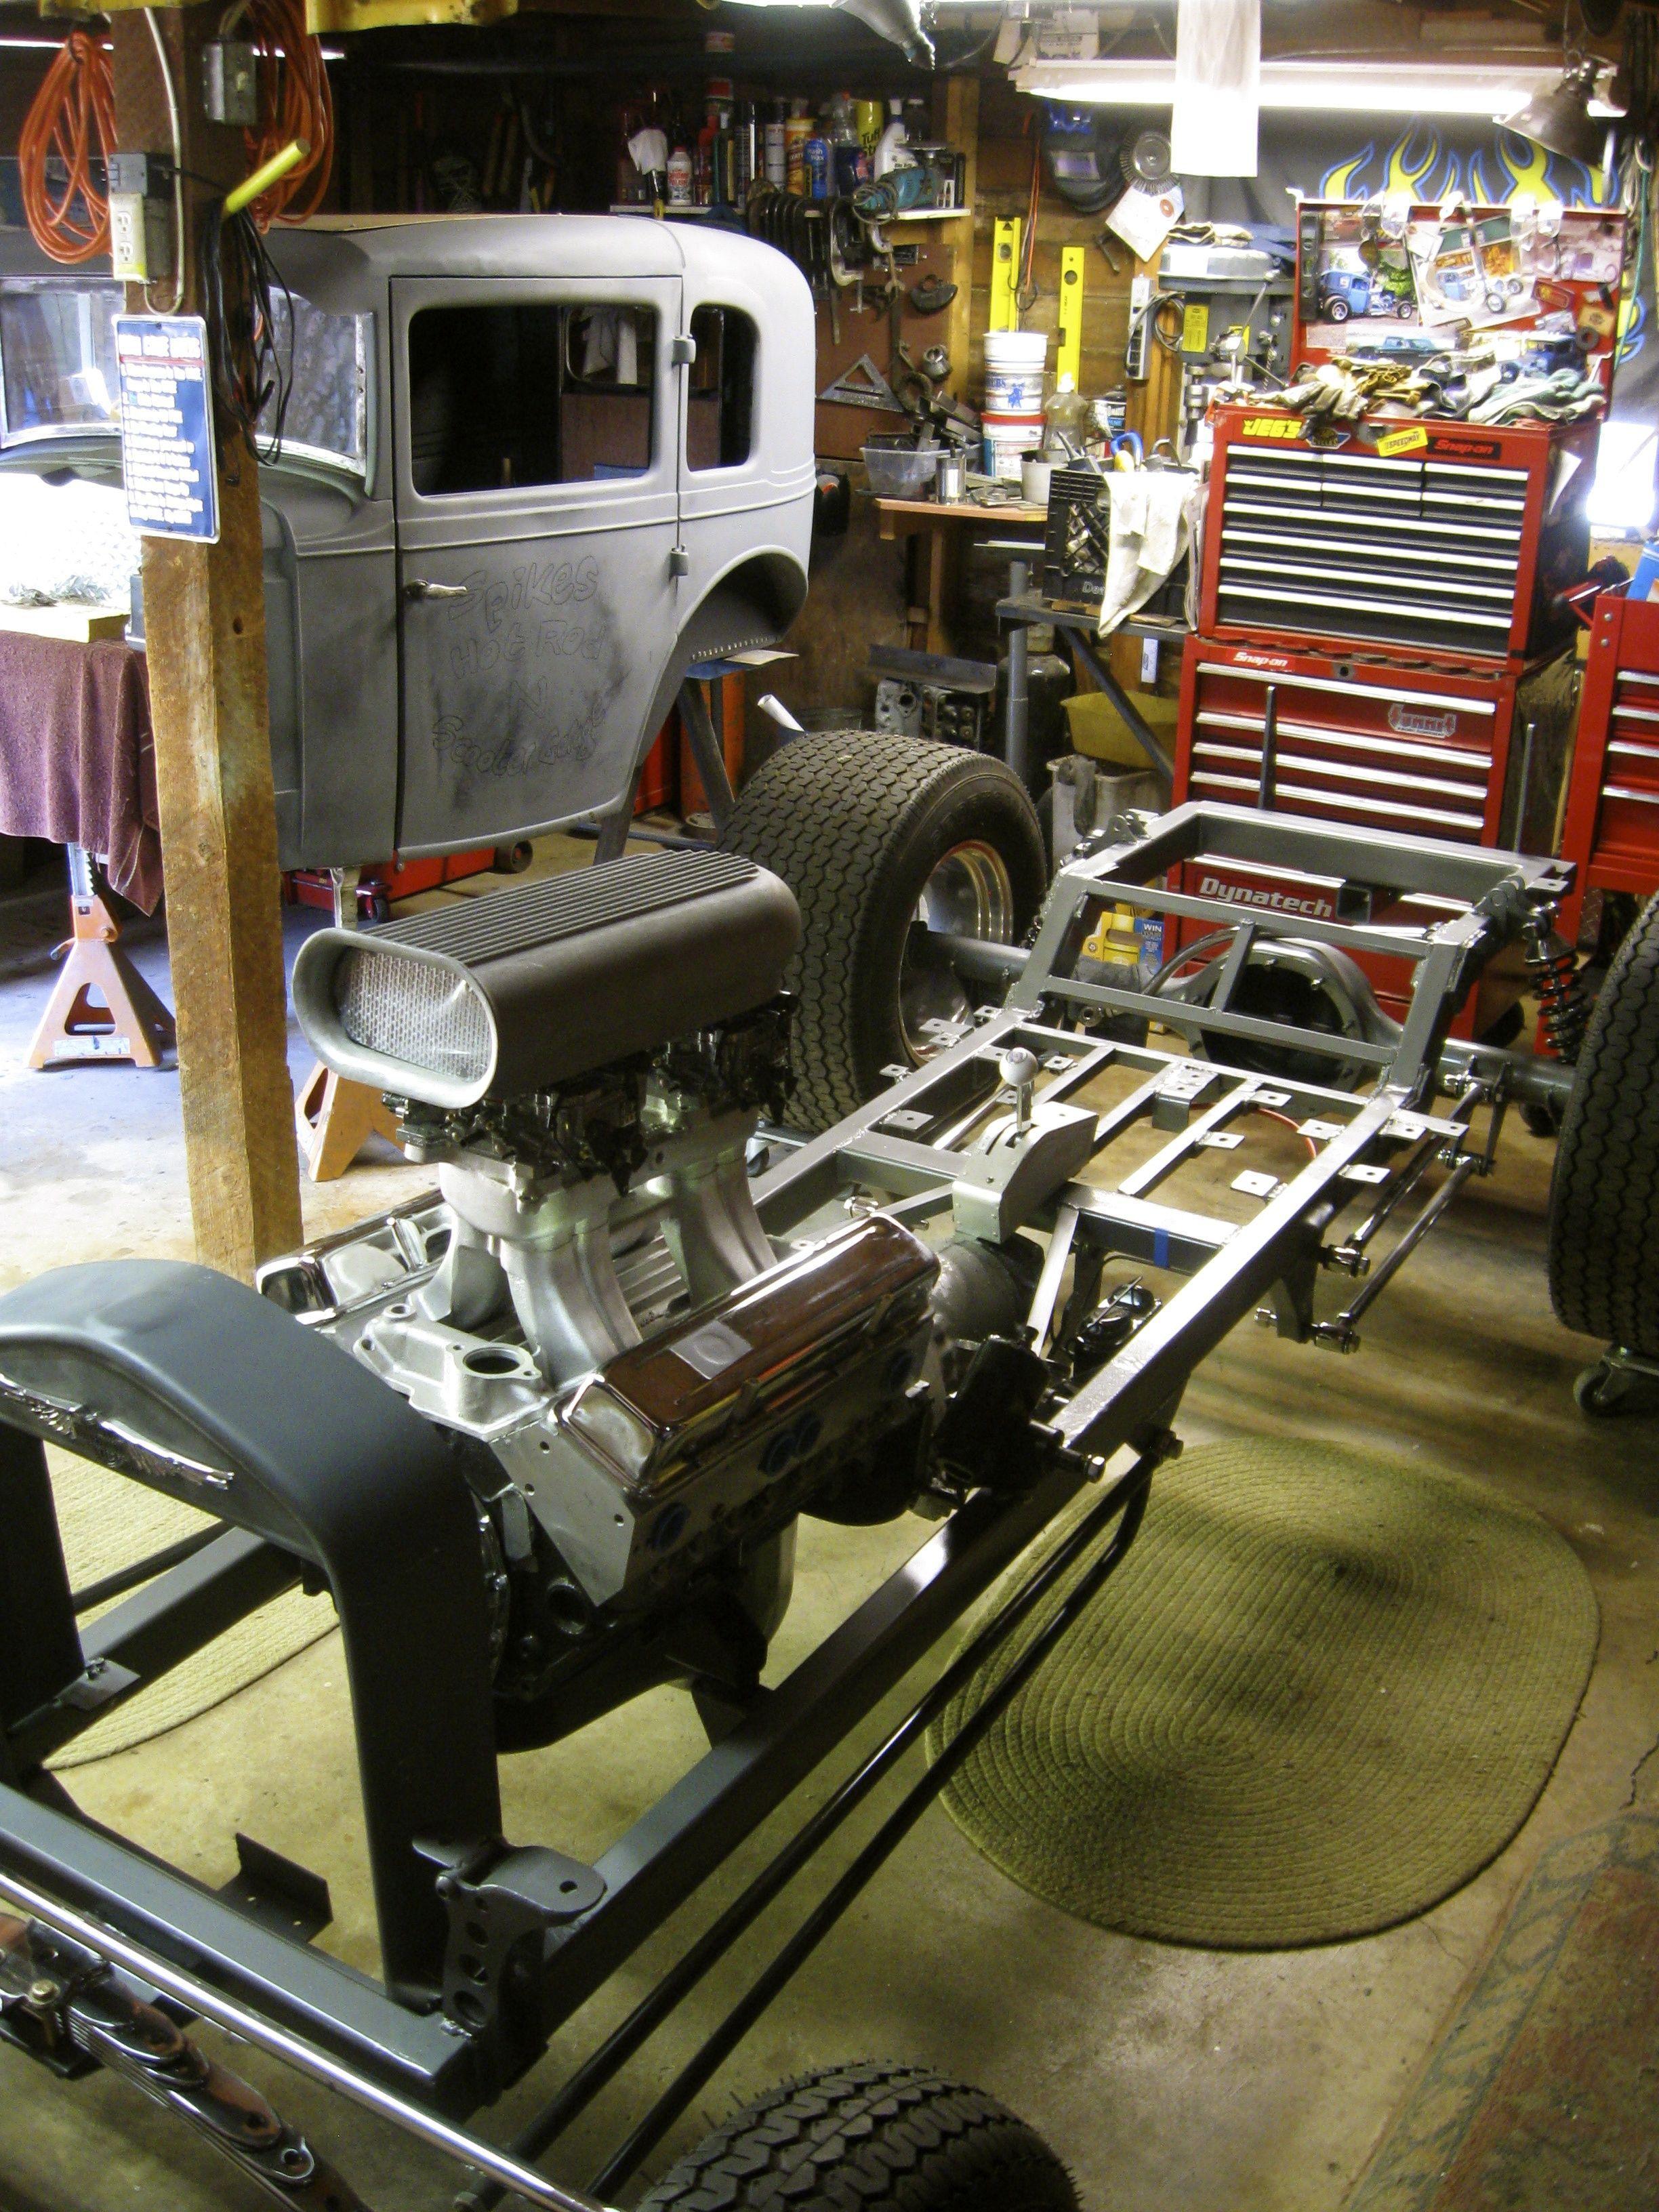 Blueprint engines customer art tardiville has installed a bp3834ct1 blueprint engines customer art tardiville has installed a bp3834ct1 into his 1930 austin bantam coupe malvernweather Choice Image